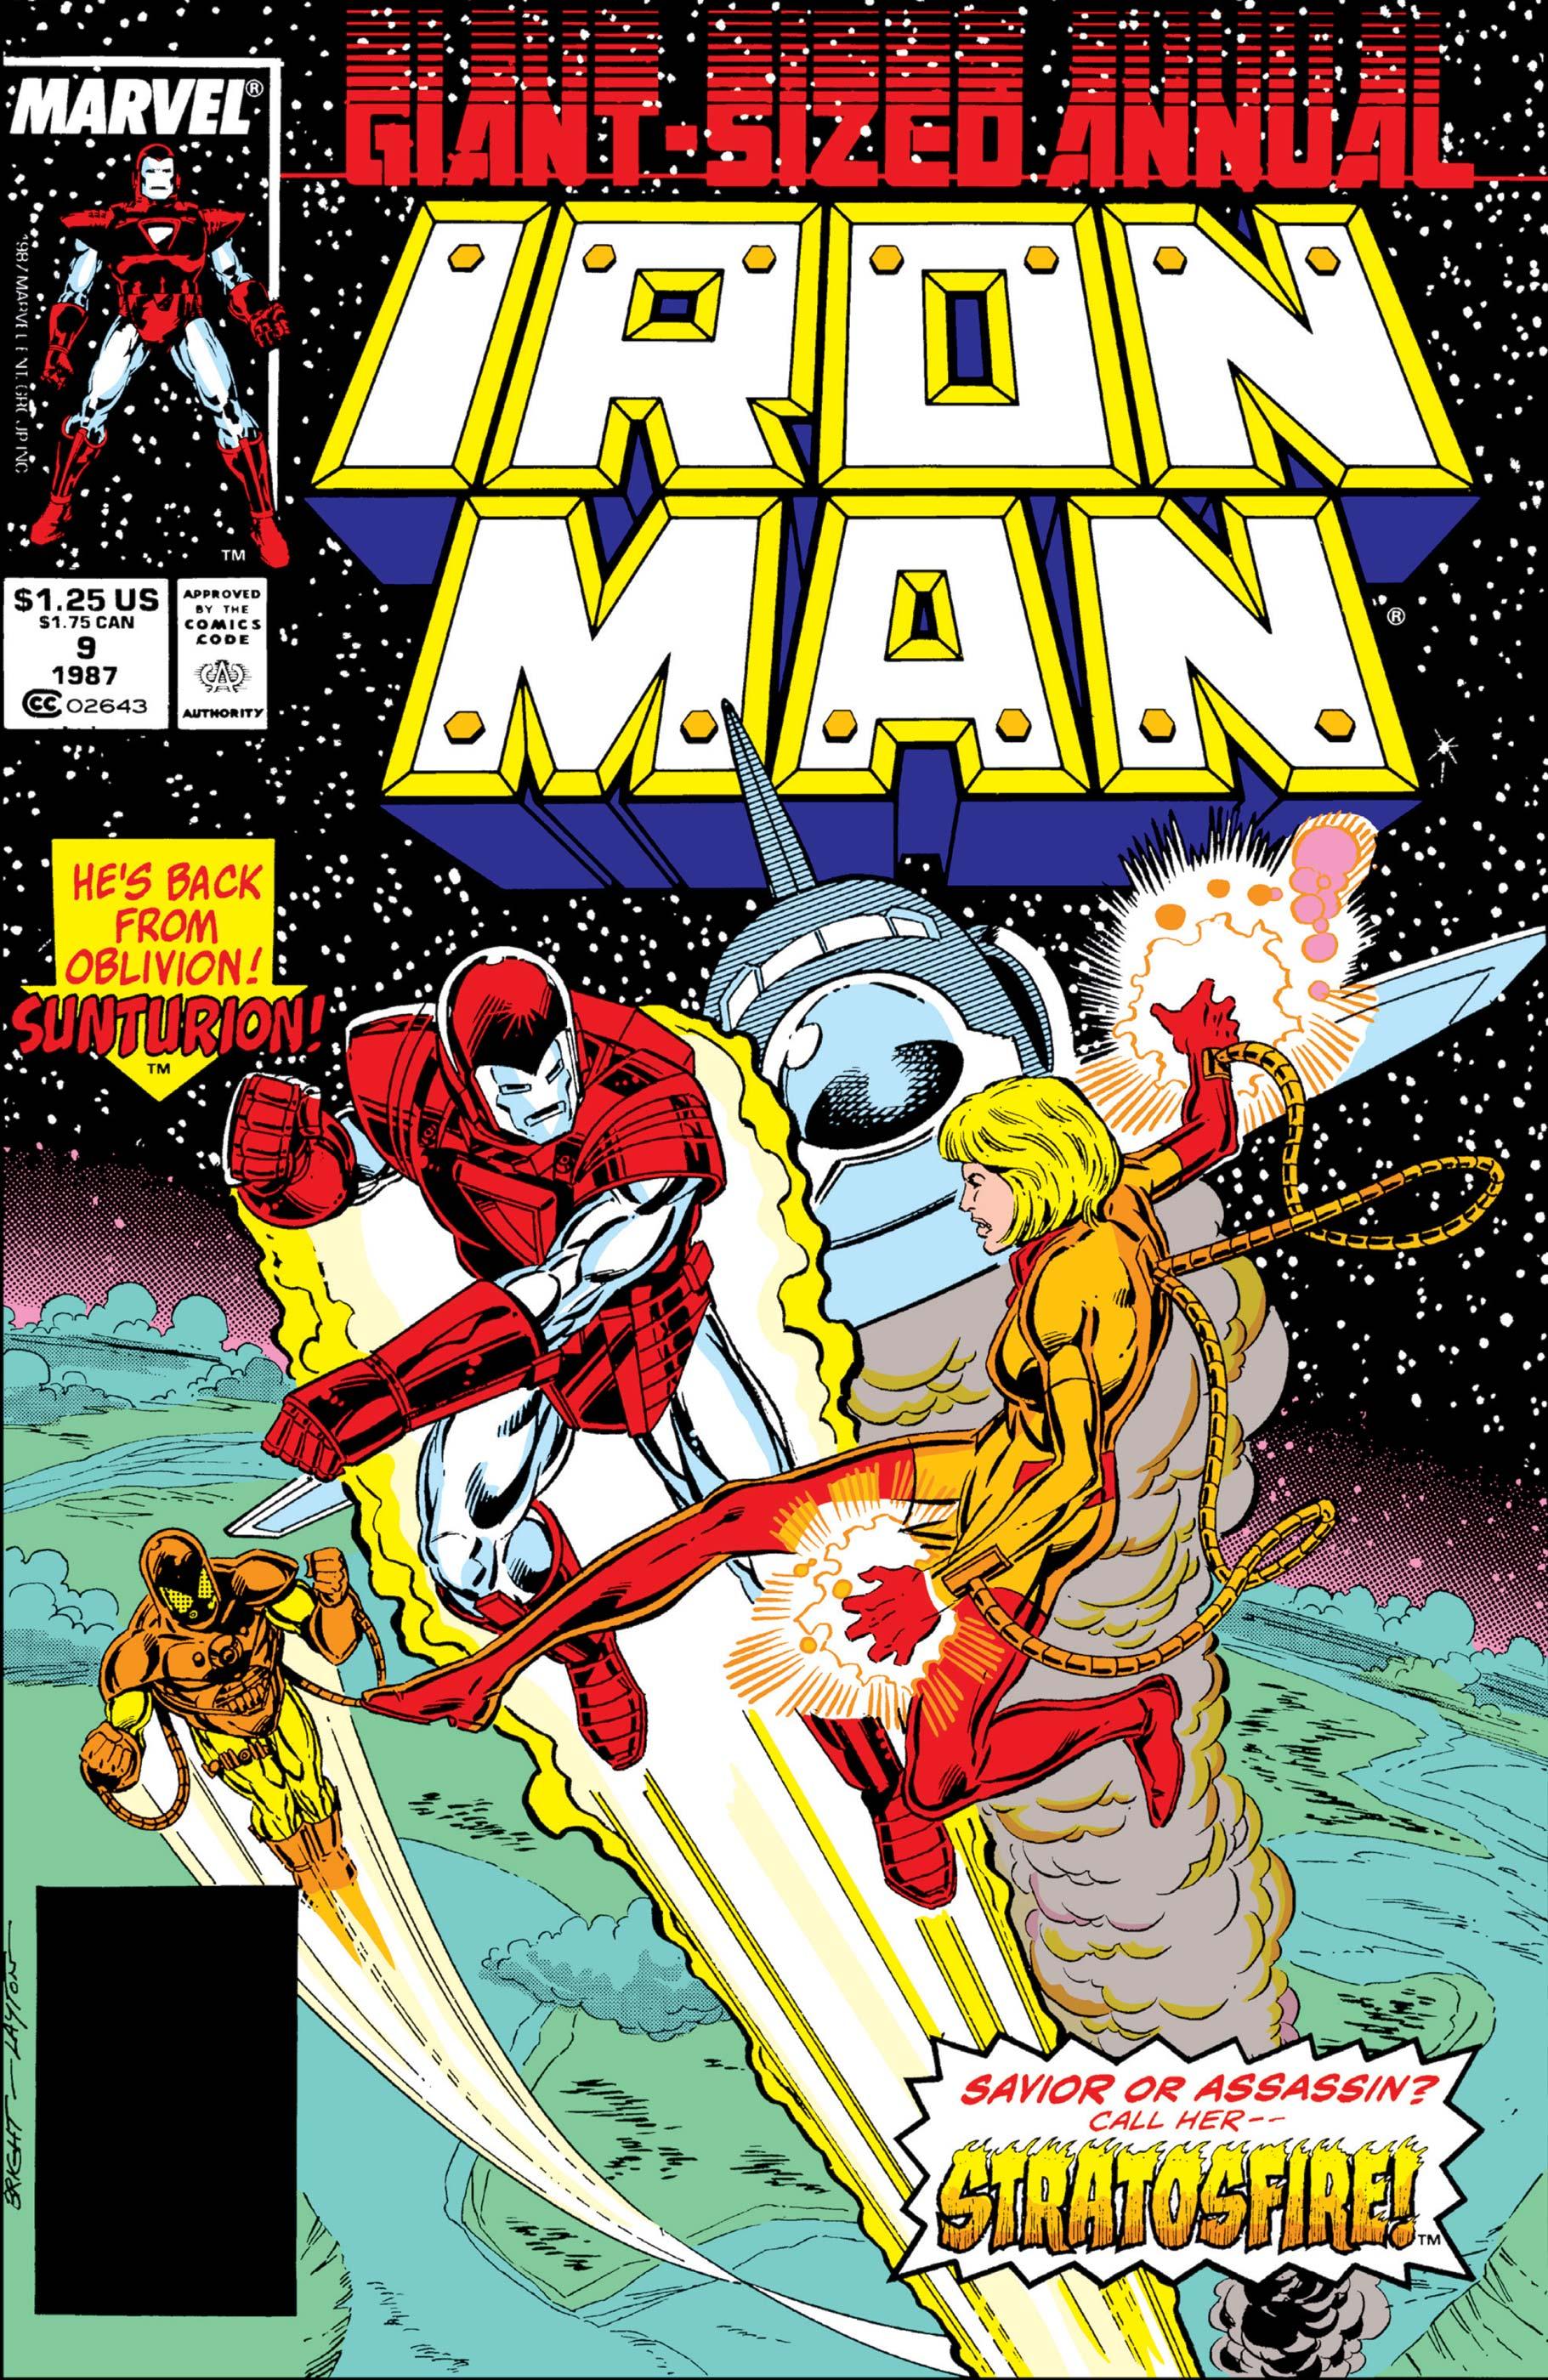 Iron Man Annual (1970) #9